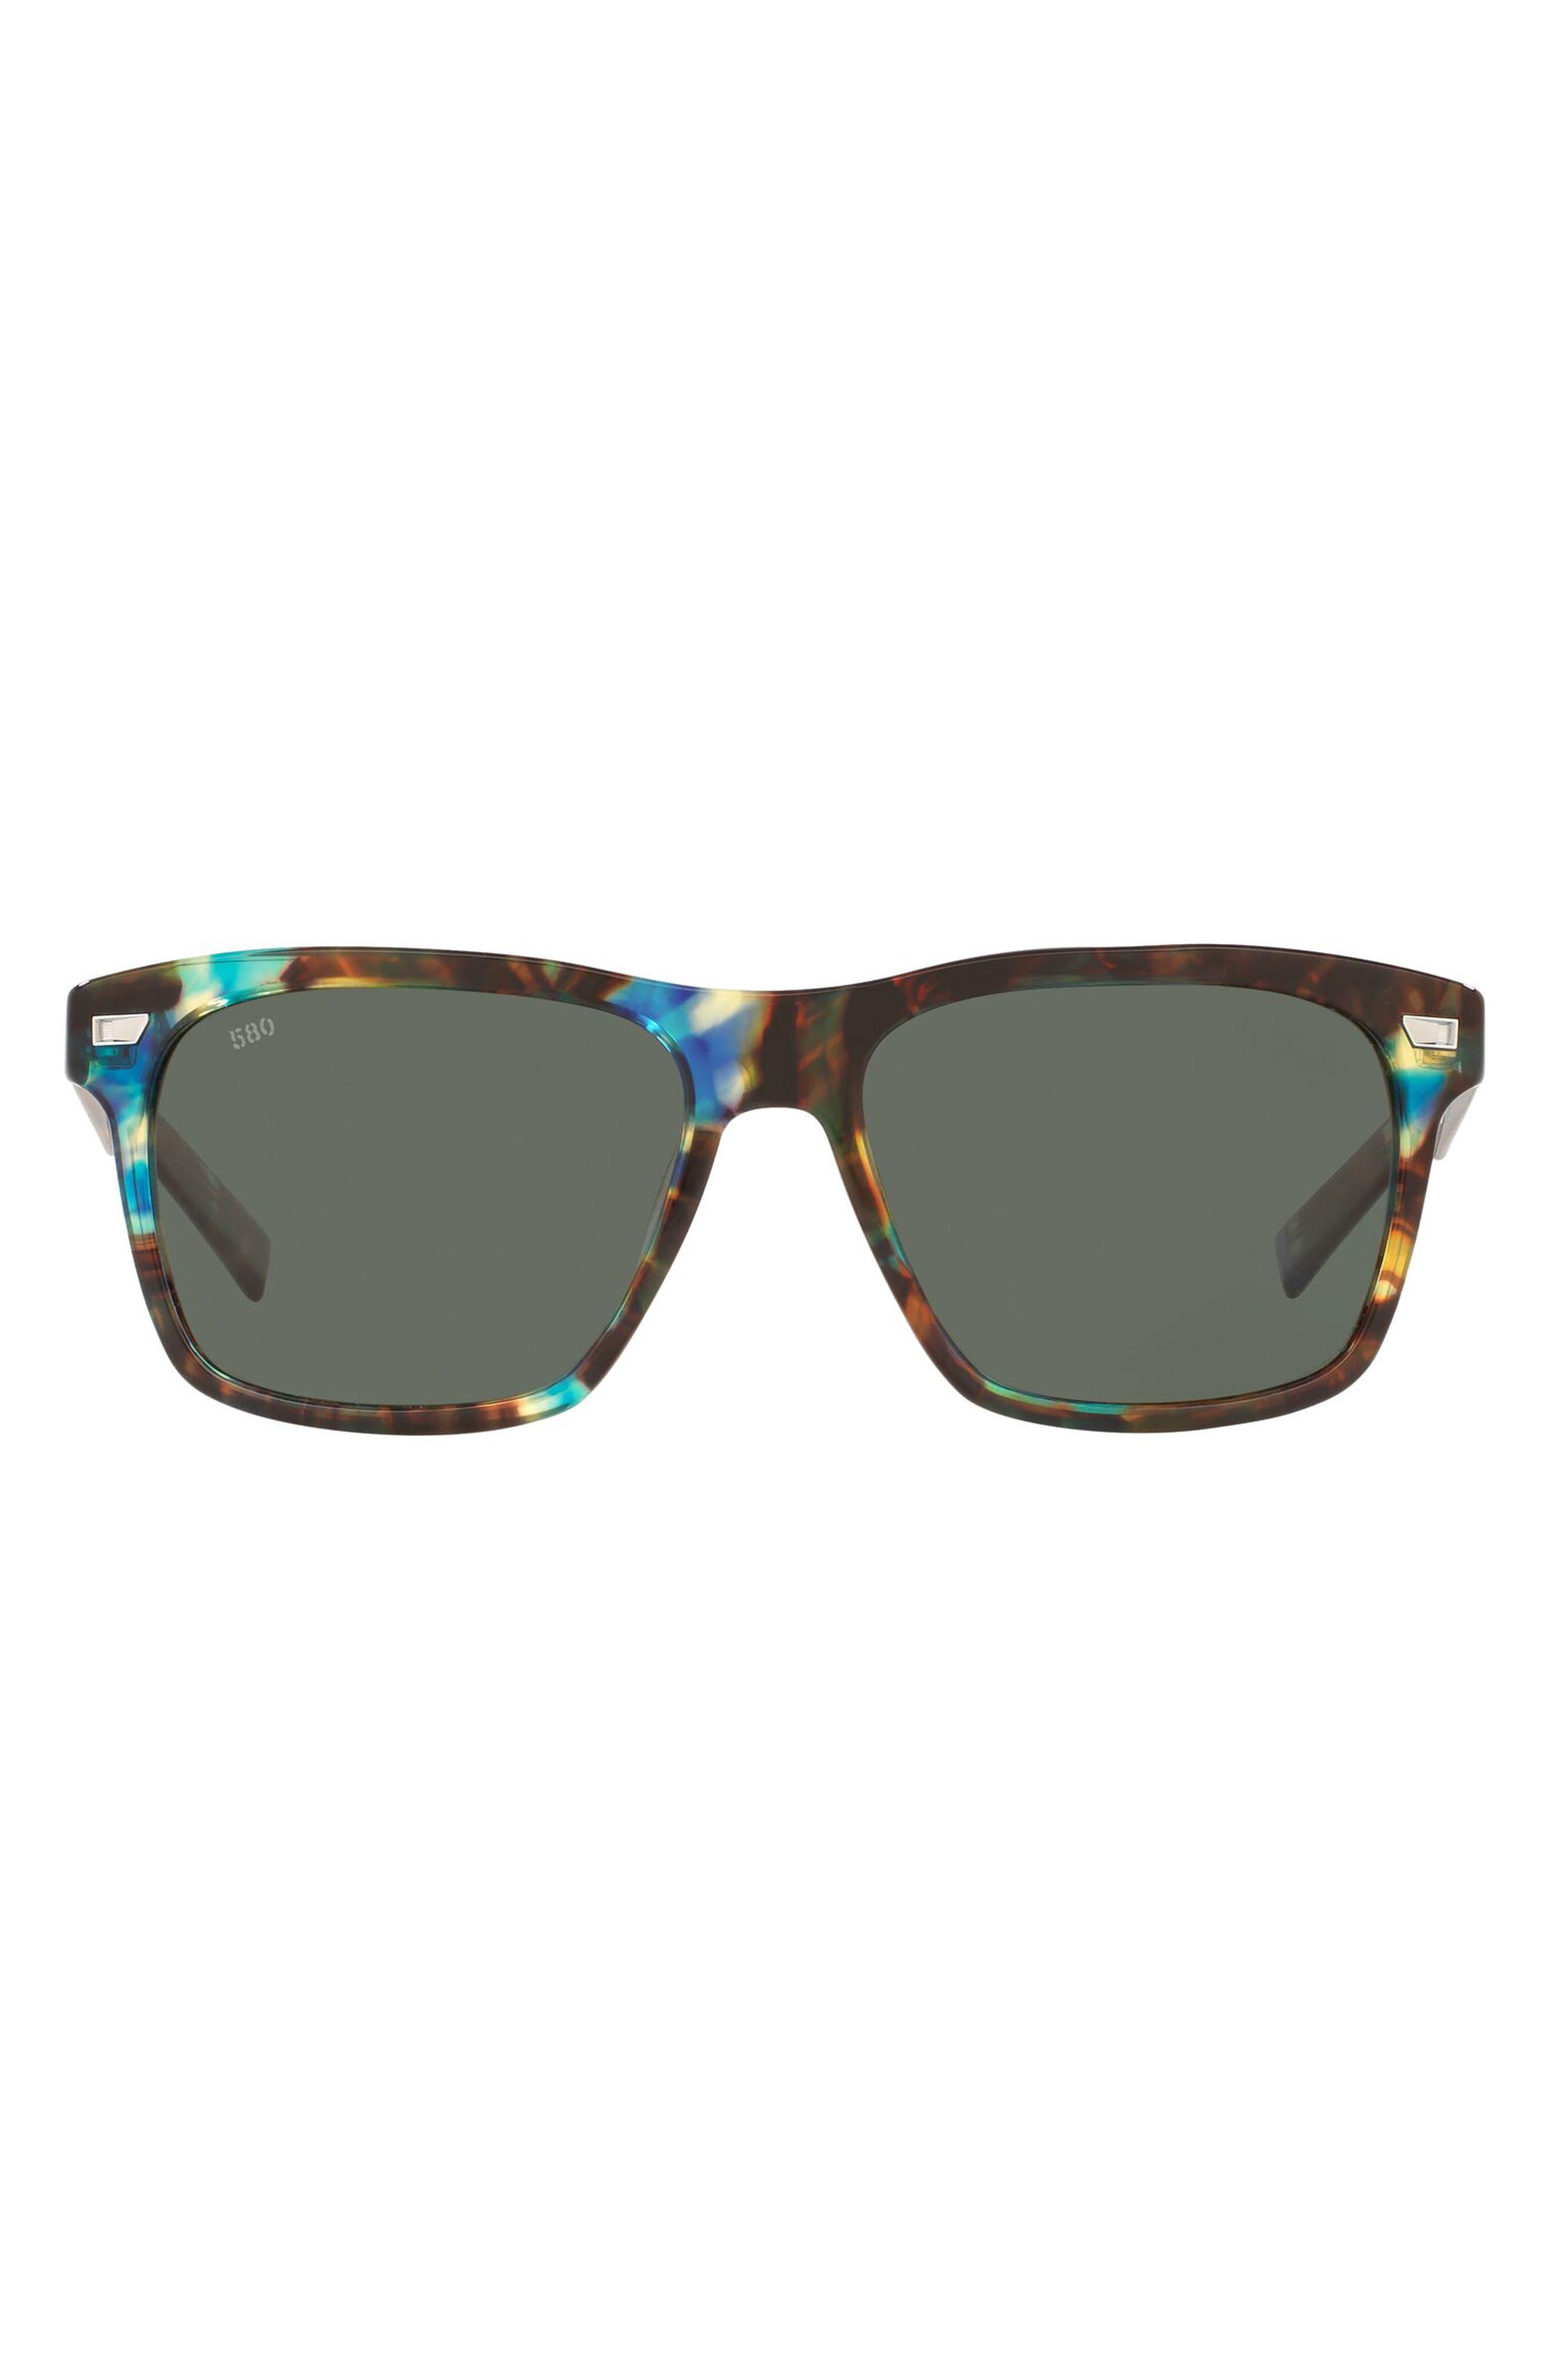 Phantos 58mm Polarized Rectangular Sunglasses